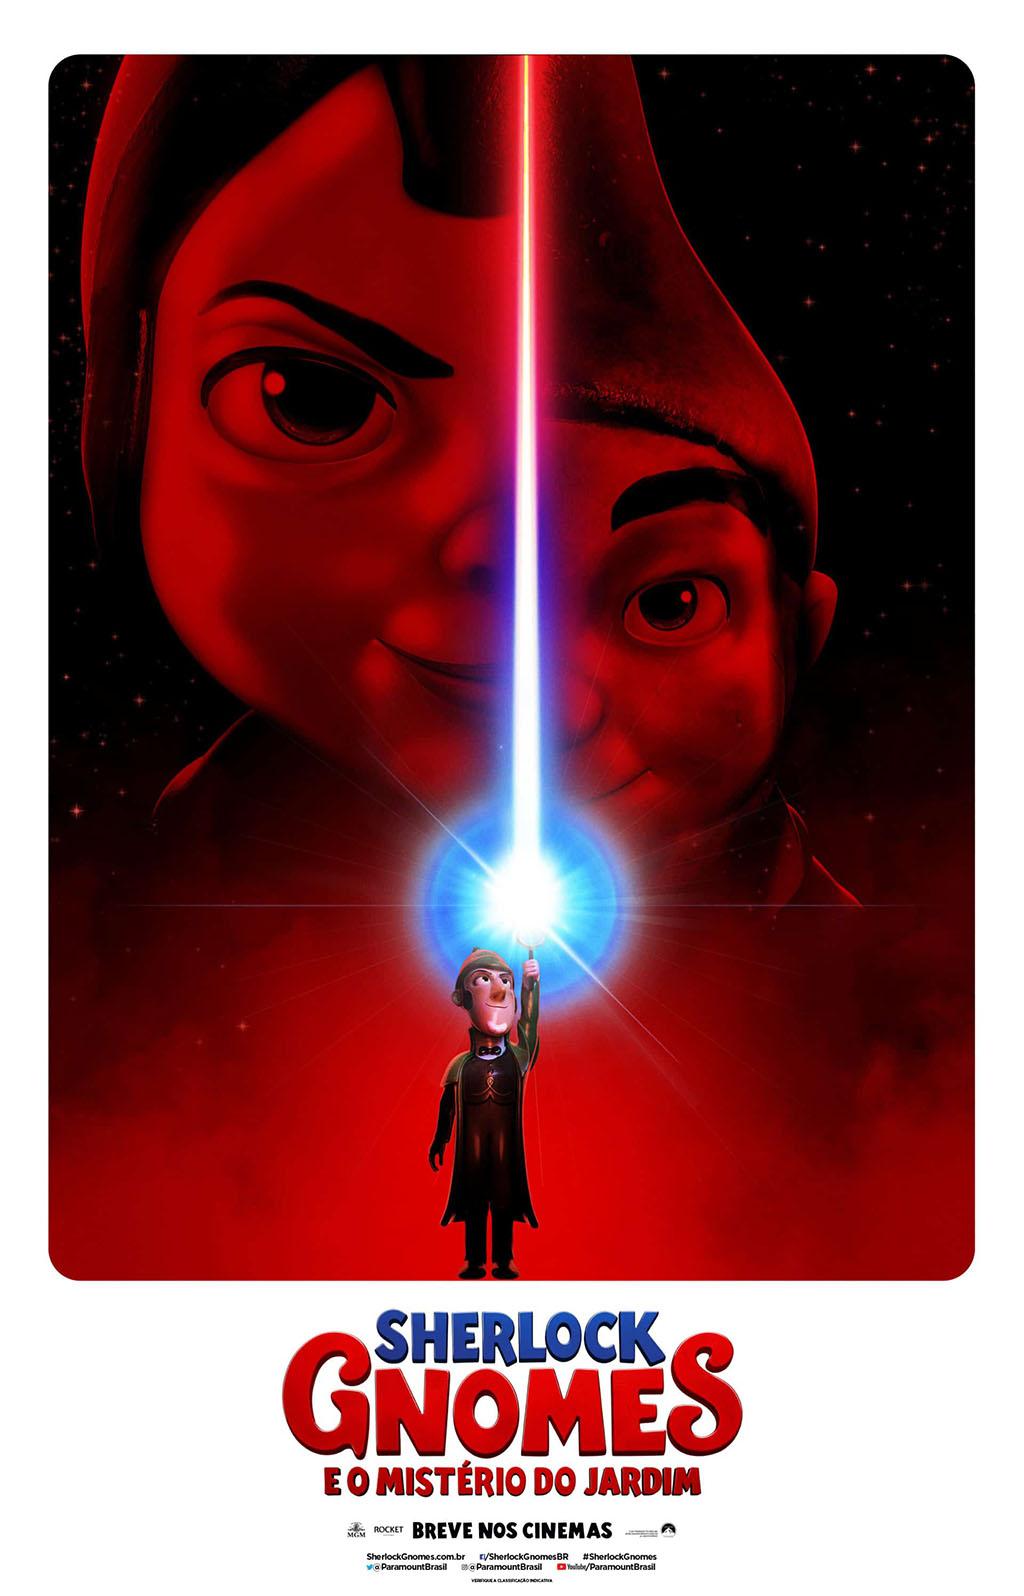 Sherlock Gnomes e o Mistério do Jardim Poster Star Wars